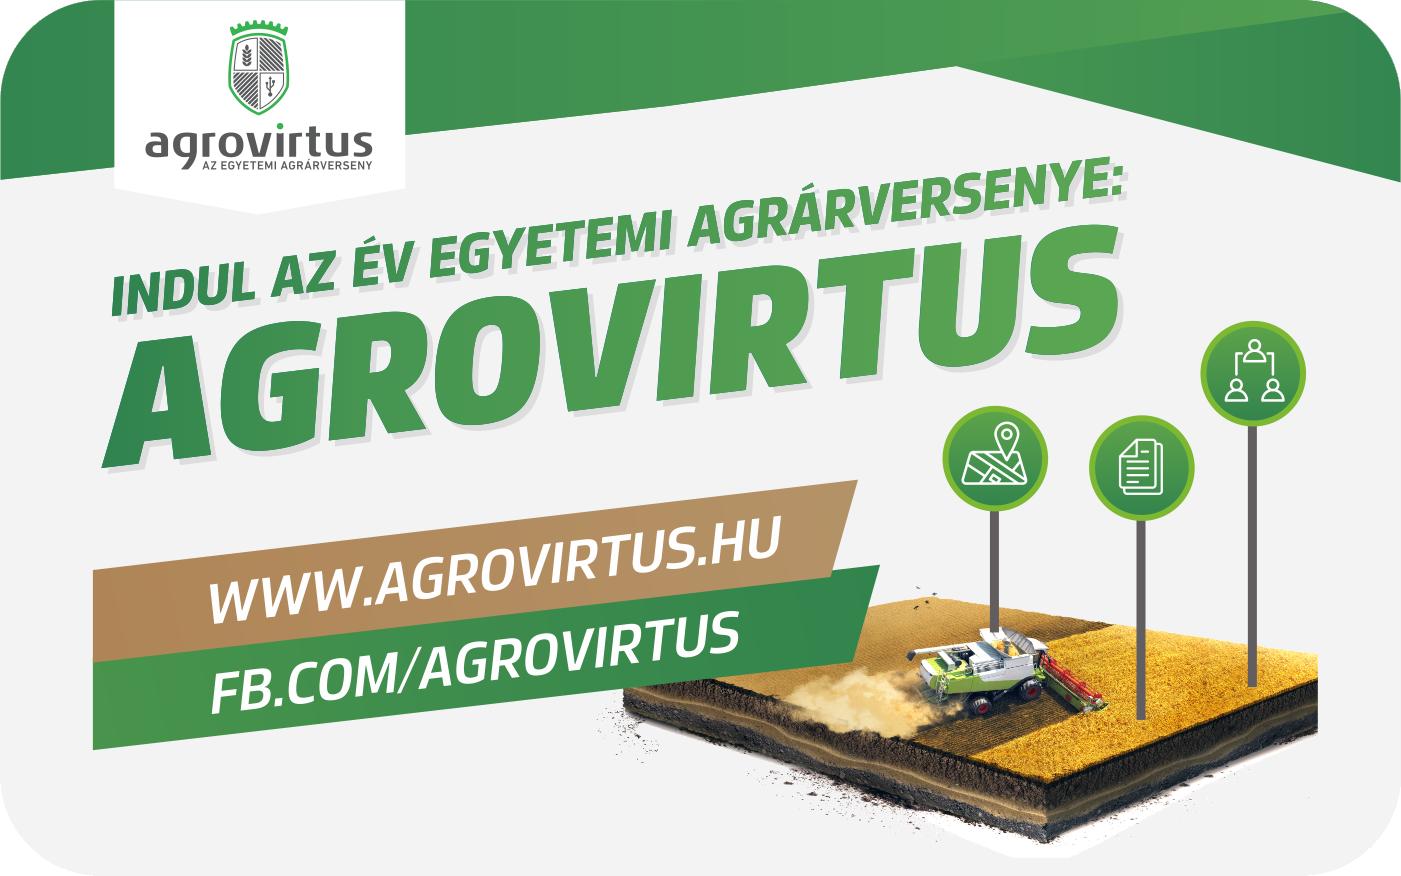 agrovirtus-1-GUT